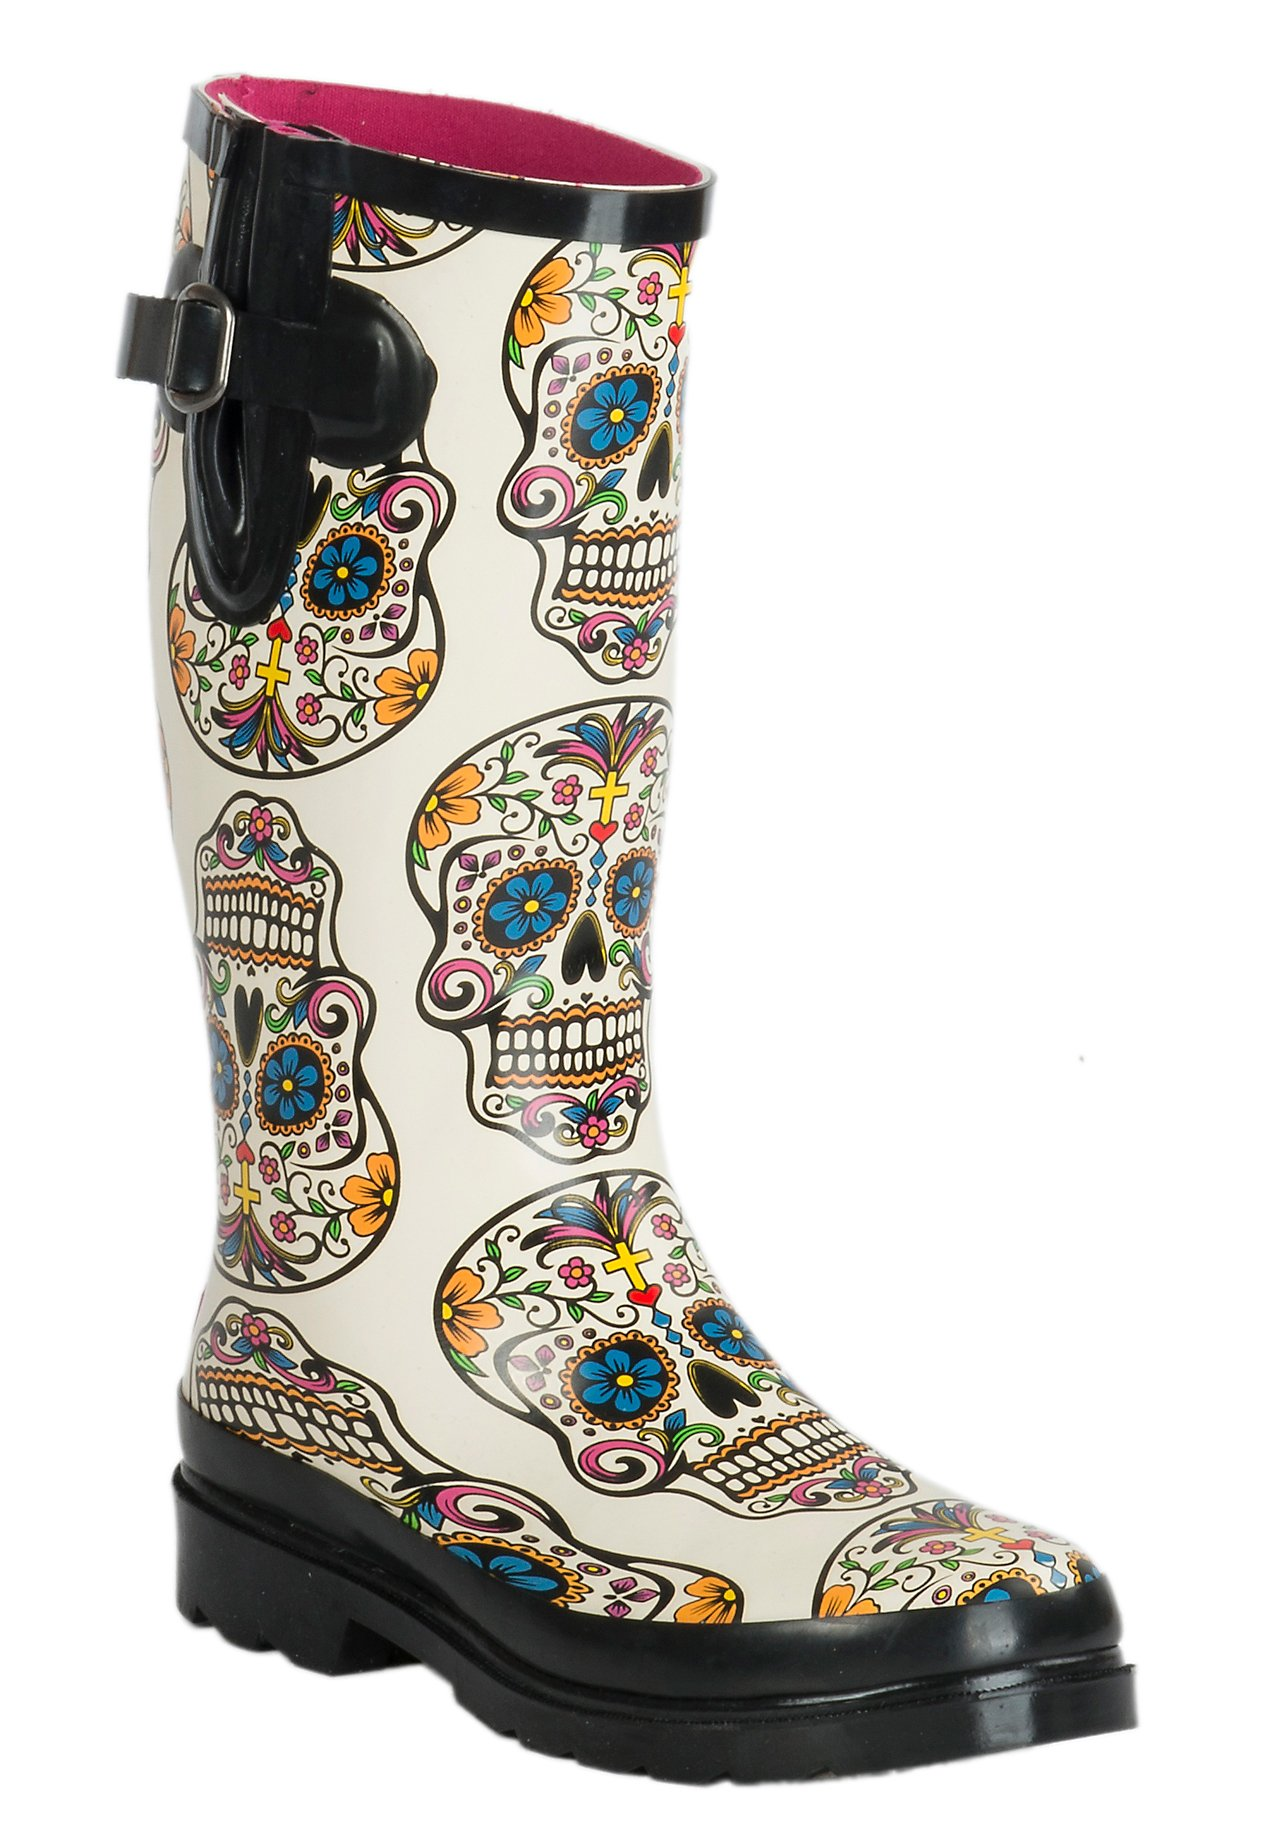 Shop Cowgirl Rain Boots - Cowboy Rain Boots for Women | Cavender's